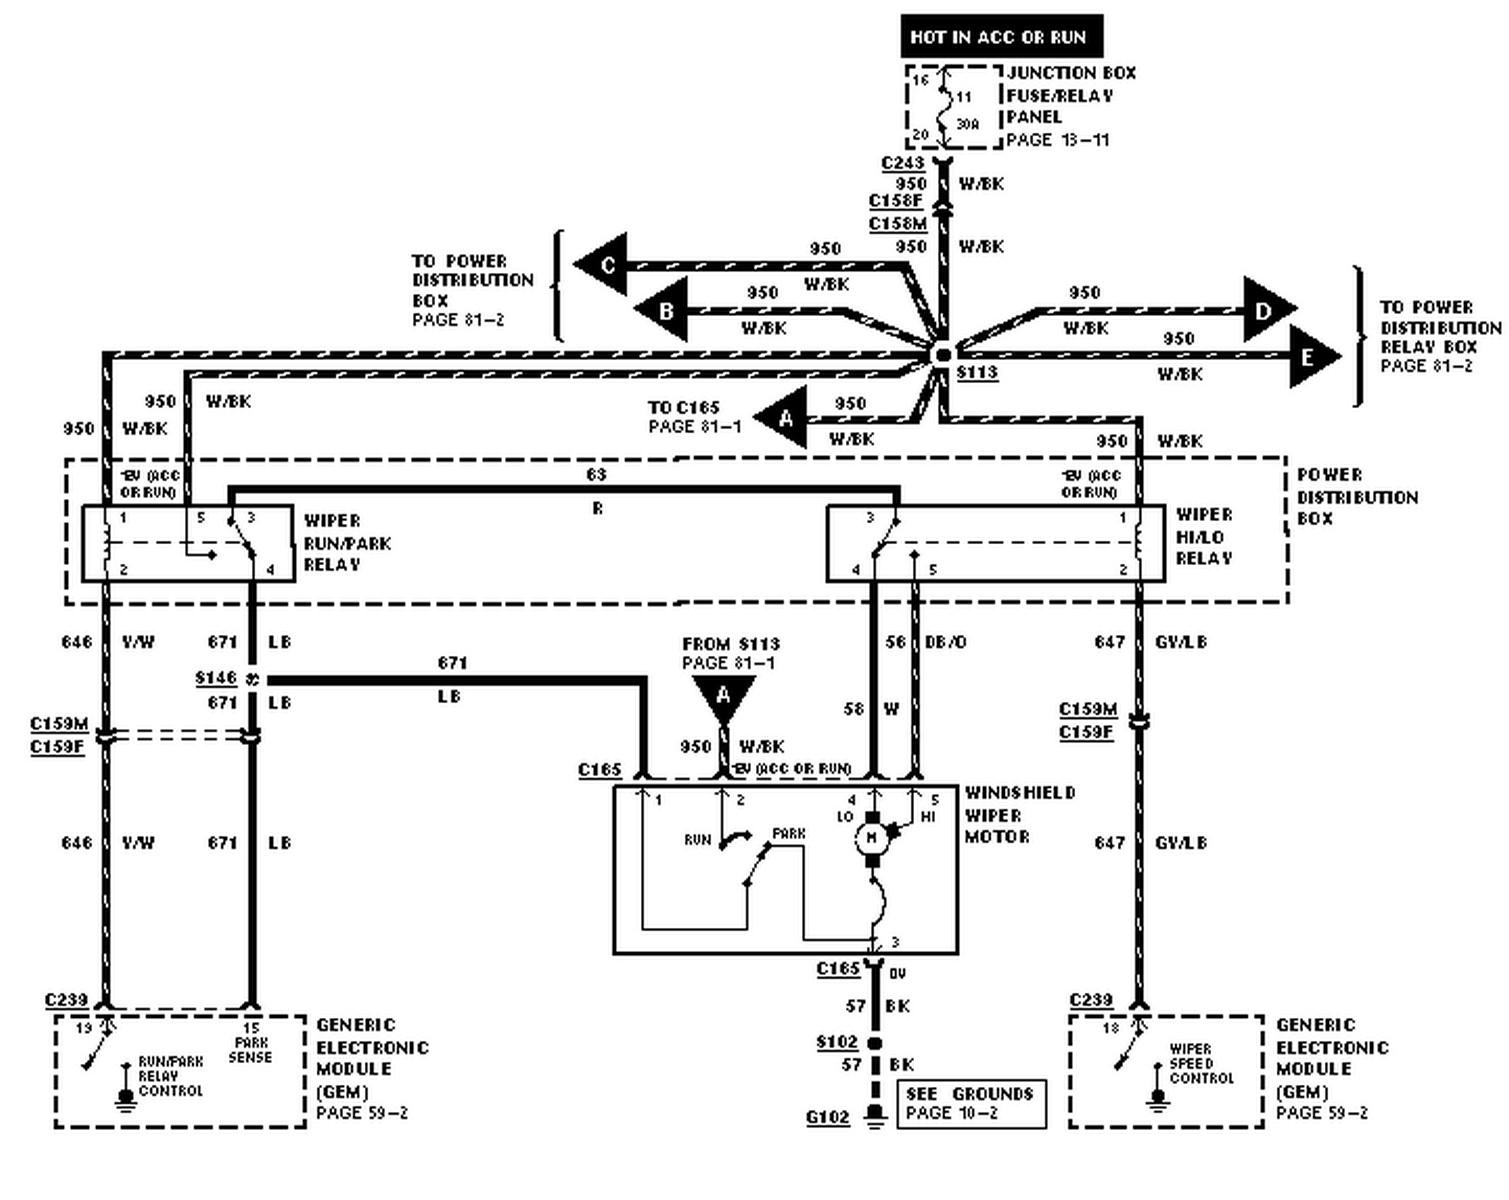 93 F150 Wiper Wiring Diagram Wiring Diagrams Data Company Company Ilsoleovunque It